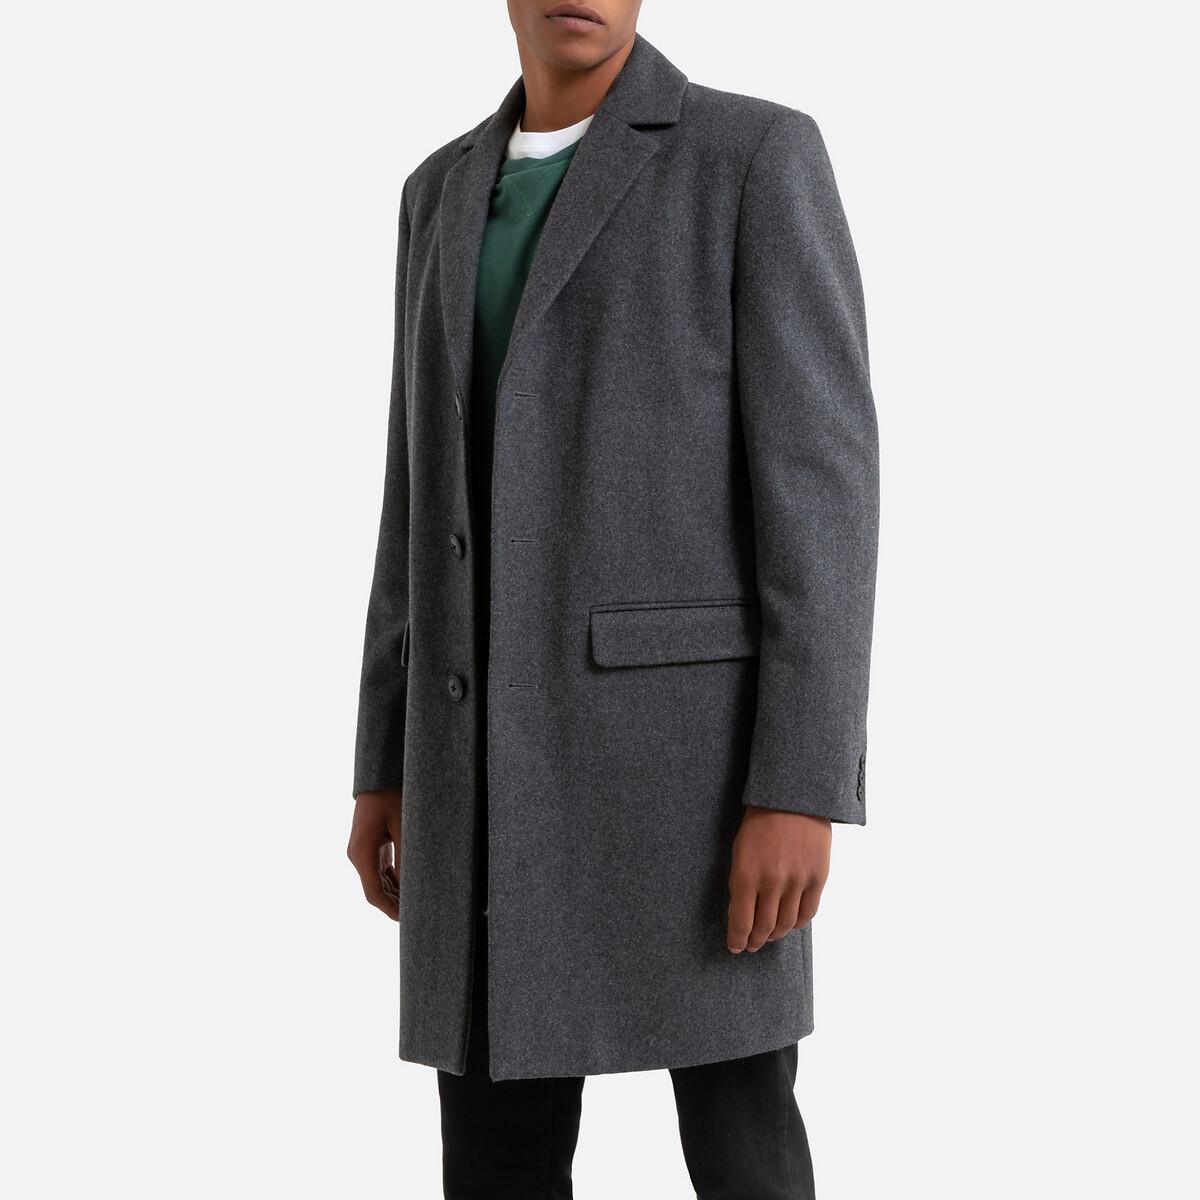 Пальто LaRedoute Прямого покроя из шерстяного драпа L серый блузка laredoute прямого покроя с бахромой l бежевый